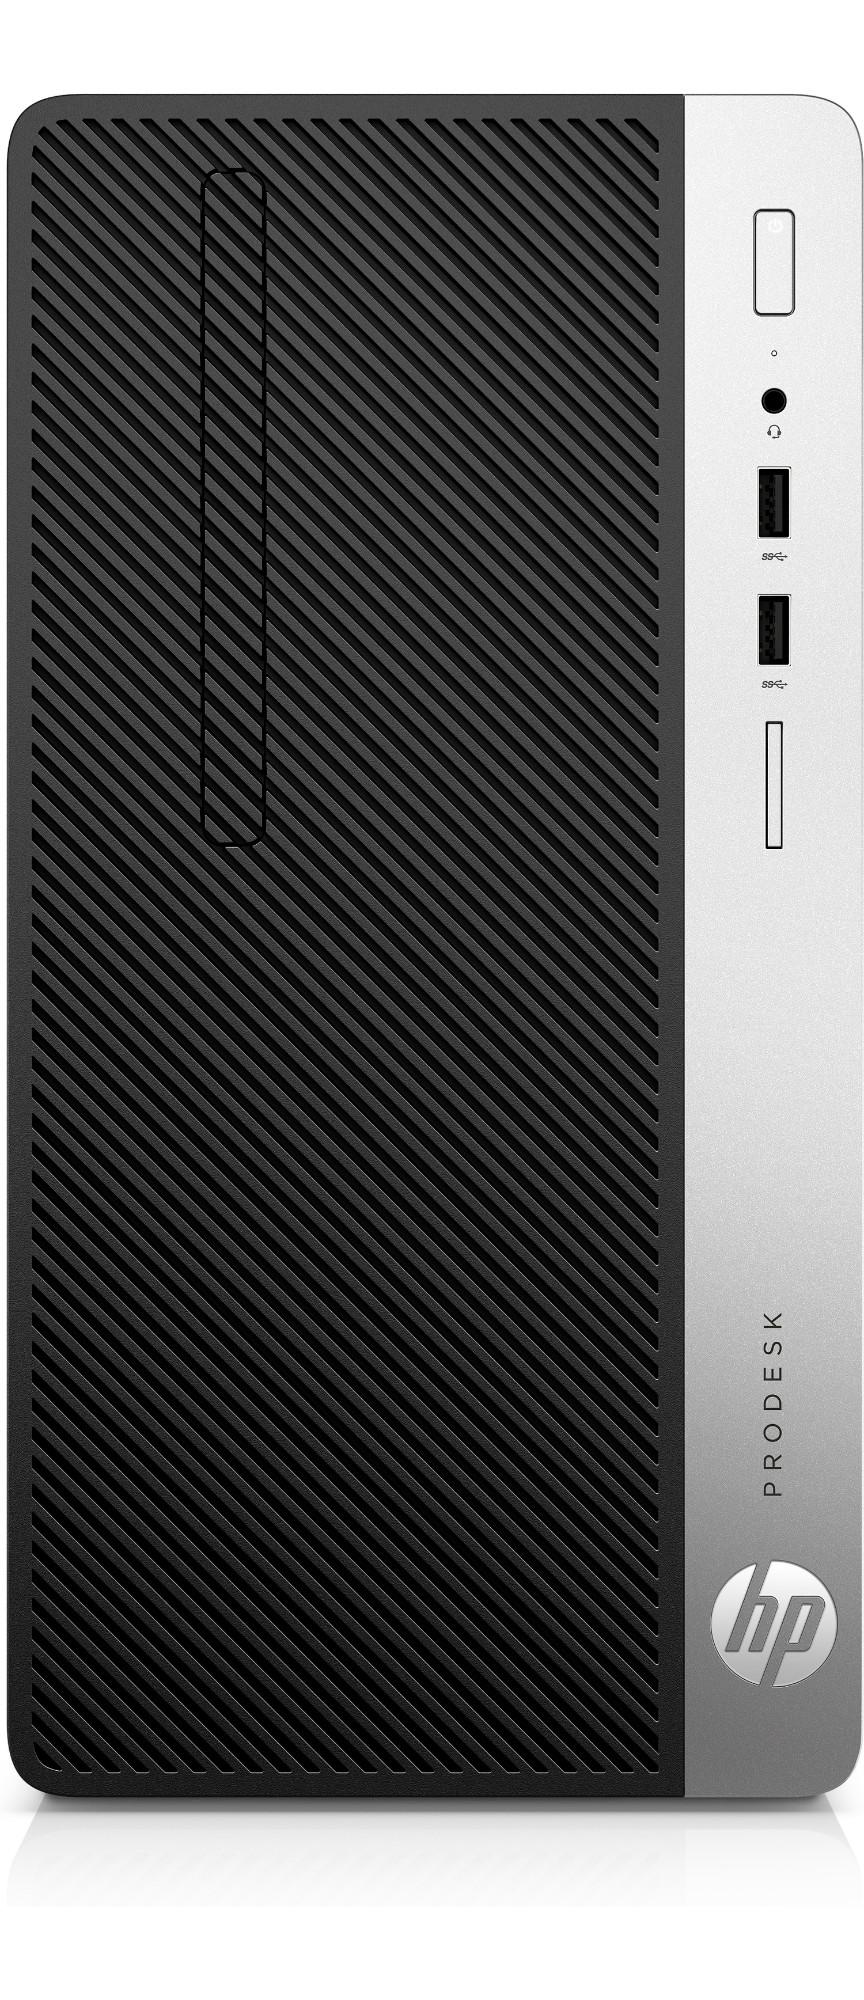 HP ProDesk 400 G4 3.4 GHz 7th gen Intel® Core™ i5 i5-7500 Black Desktop PC